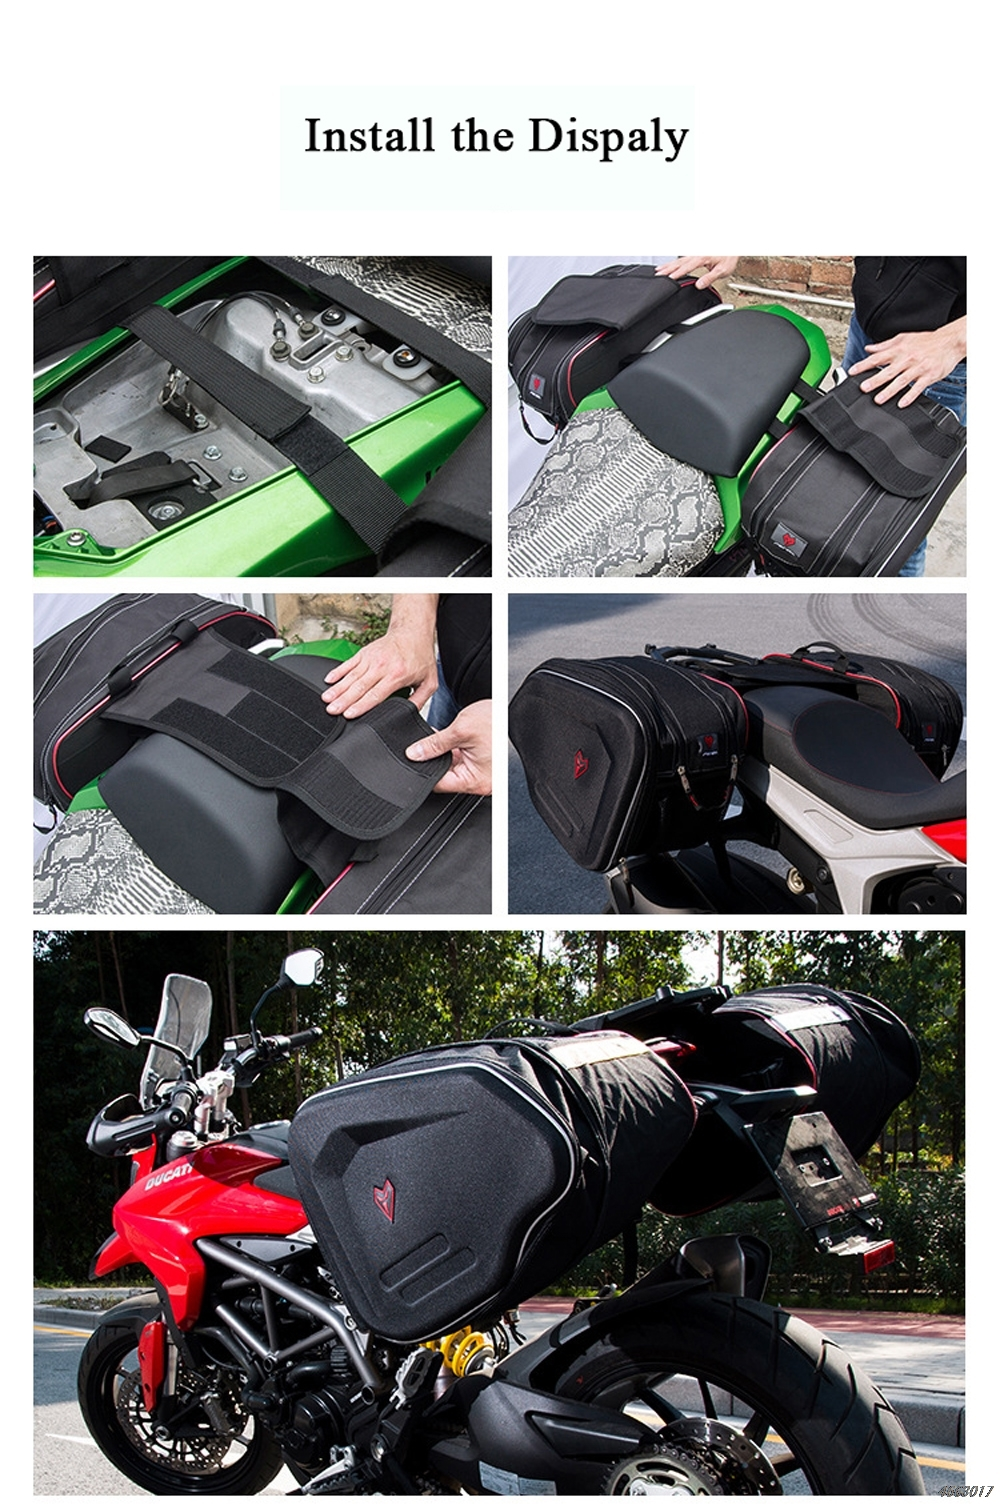 Pro-X Piston Kit Standard Bore 53.97mm For Honda Cr125r 01.1218.a4 19-4260d